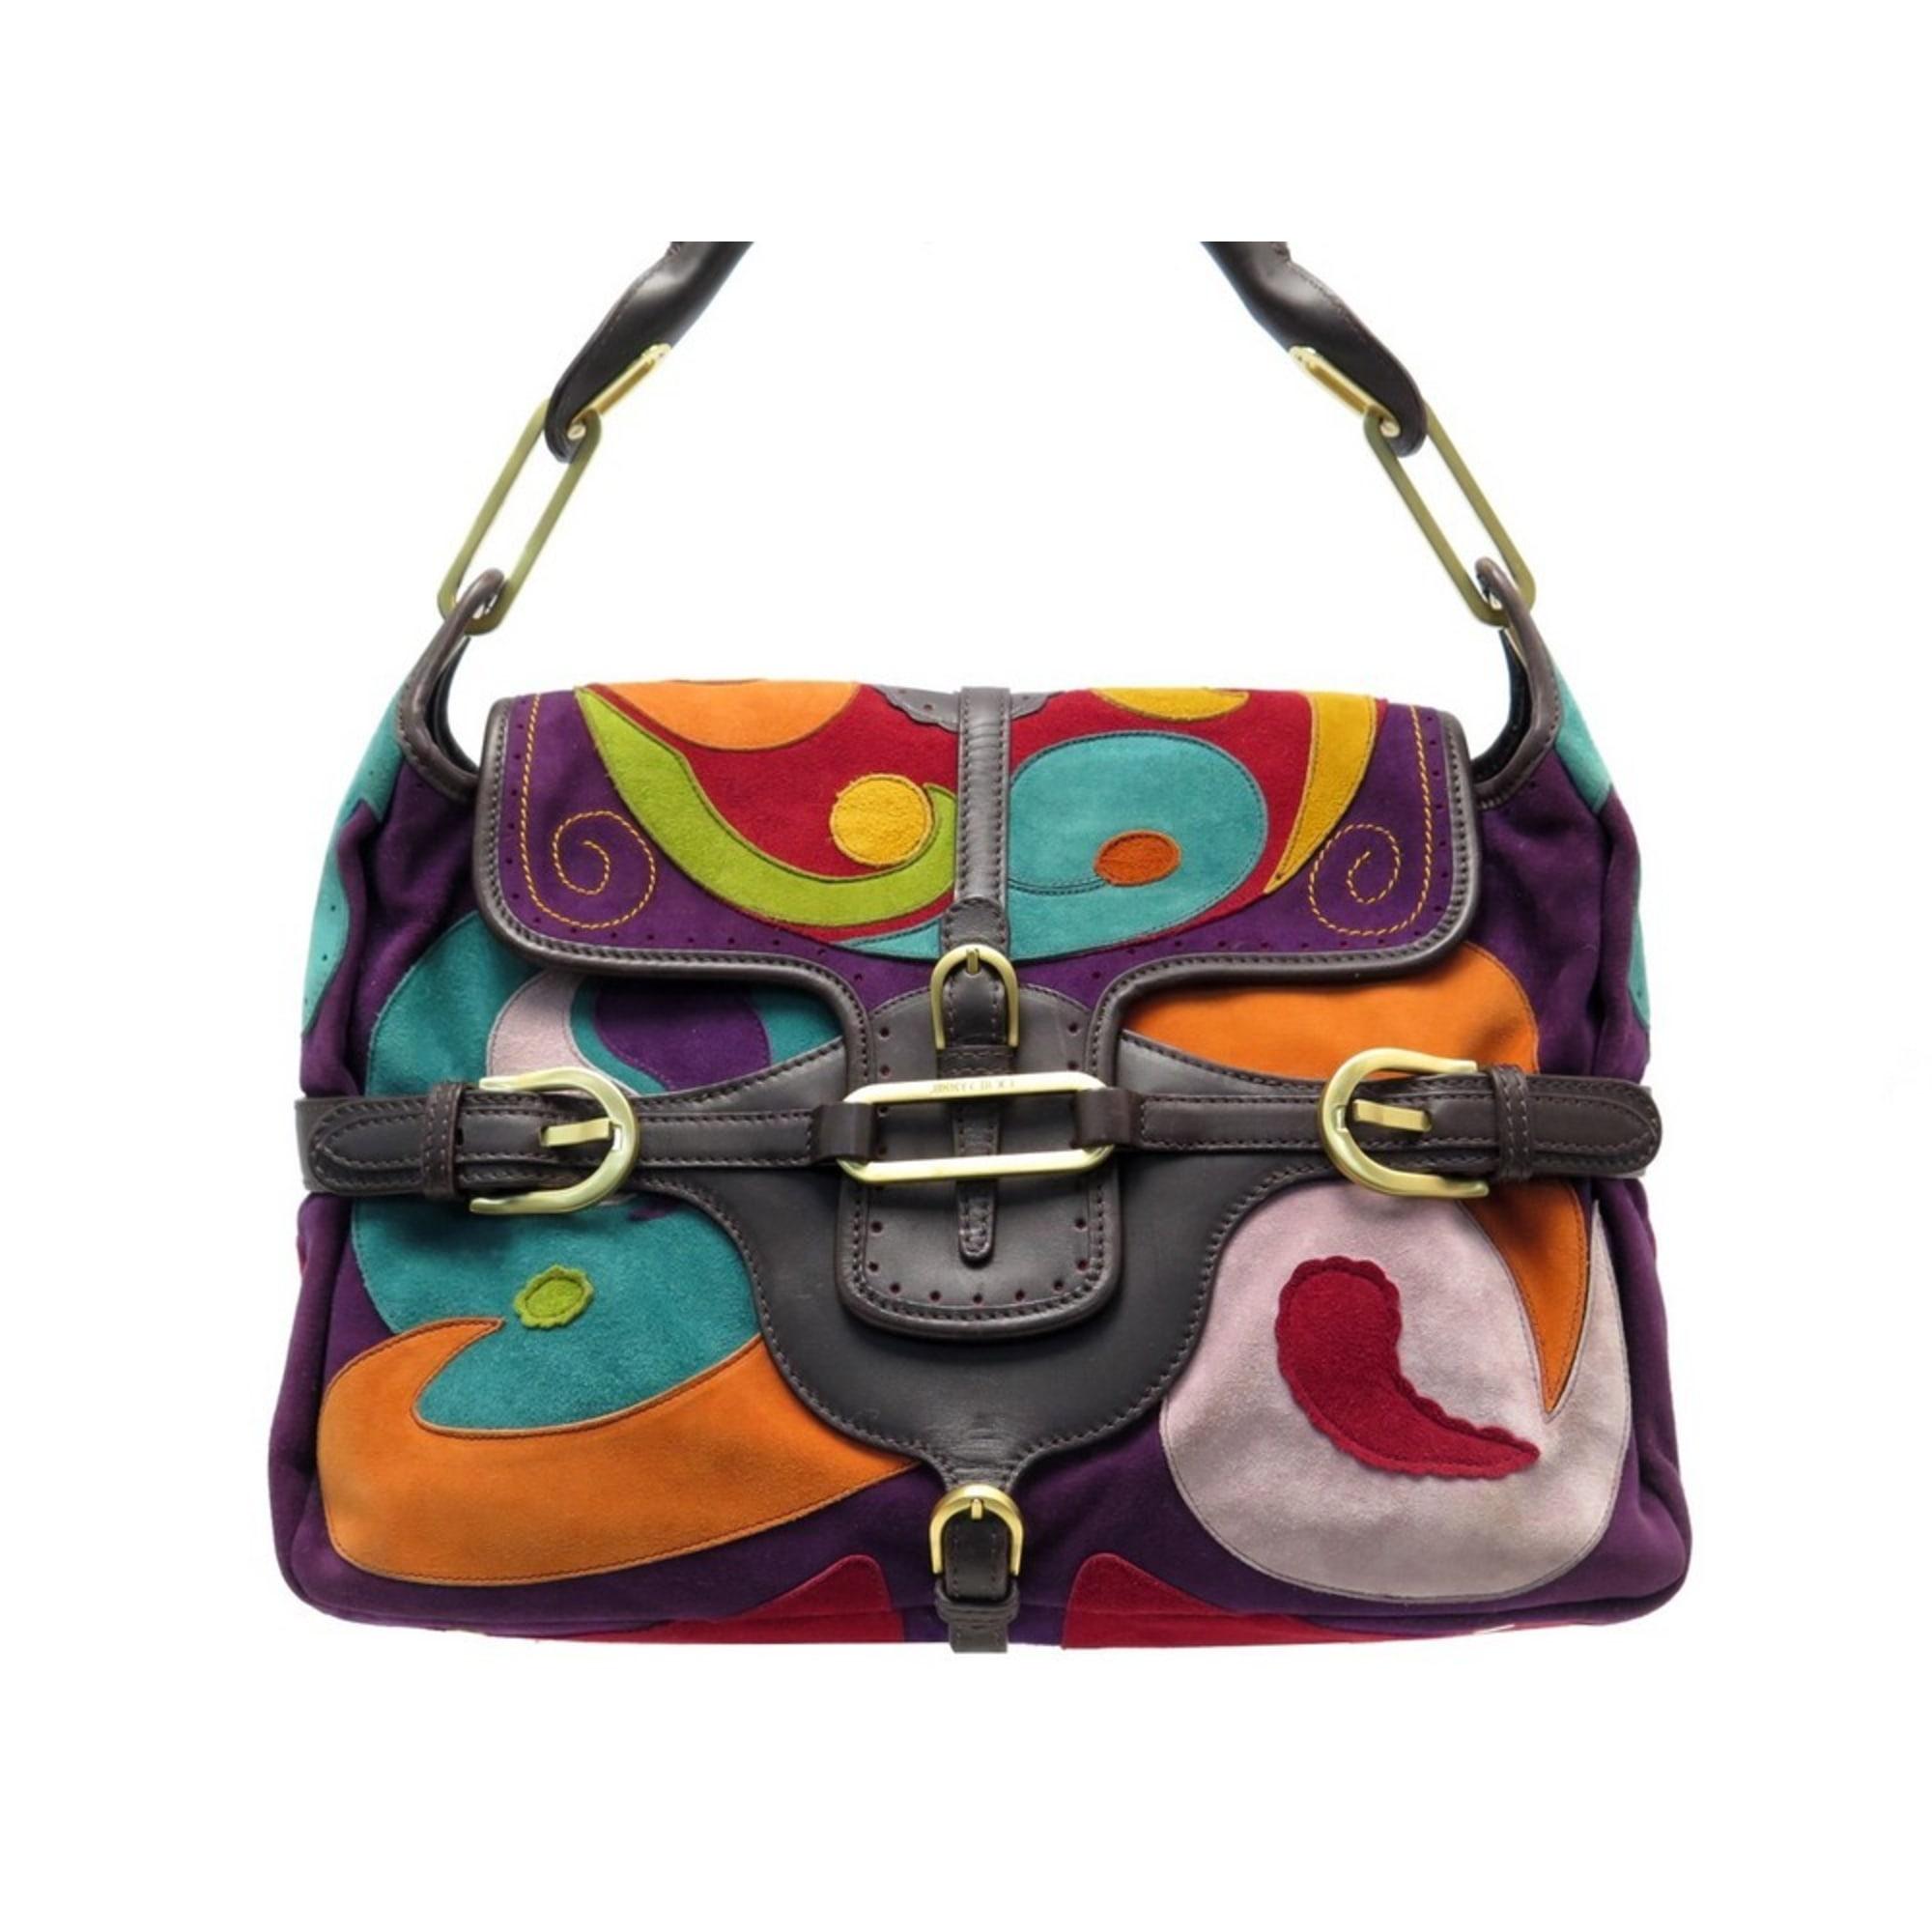 Lederhandtasche JIMMY CHOO Multicolore